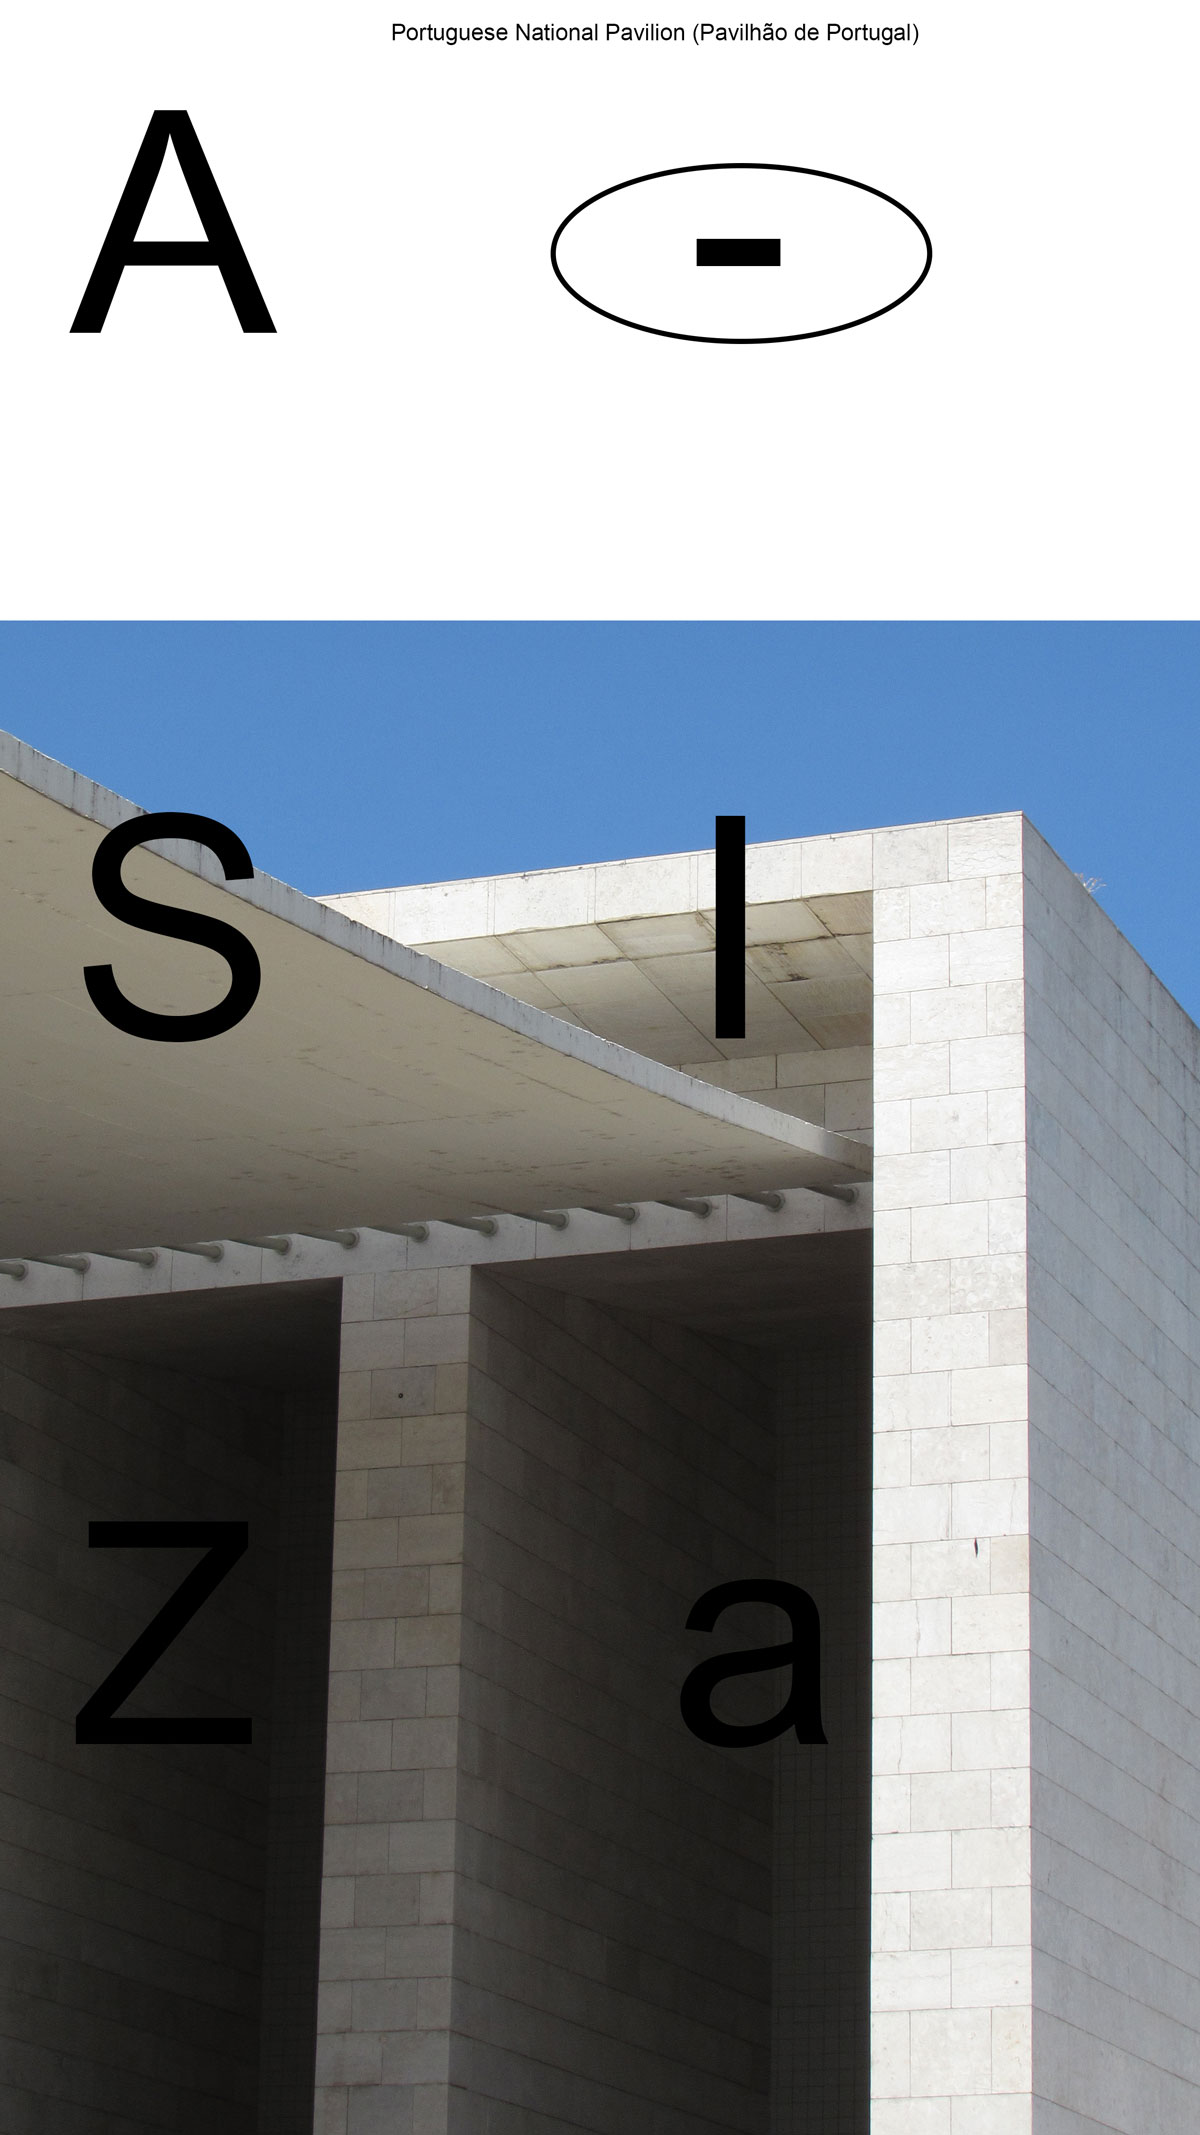 Sizapavillonlisboa